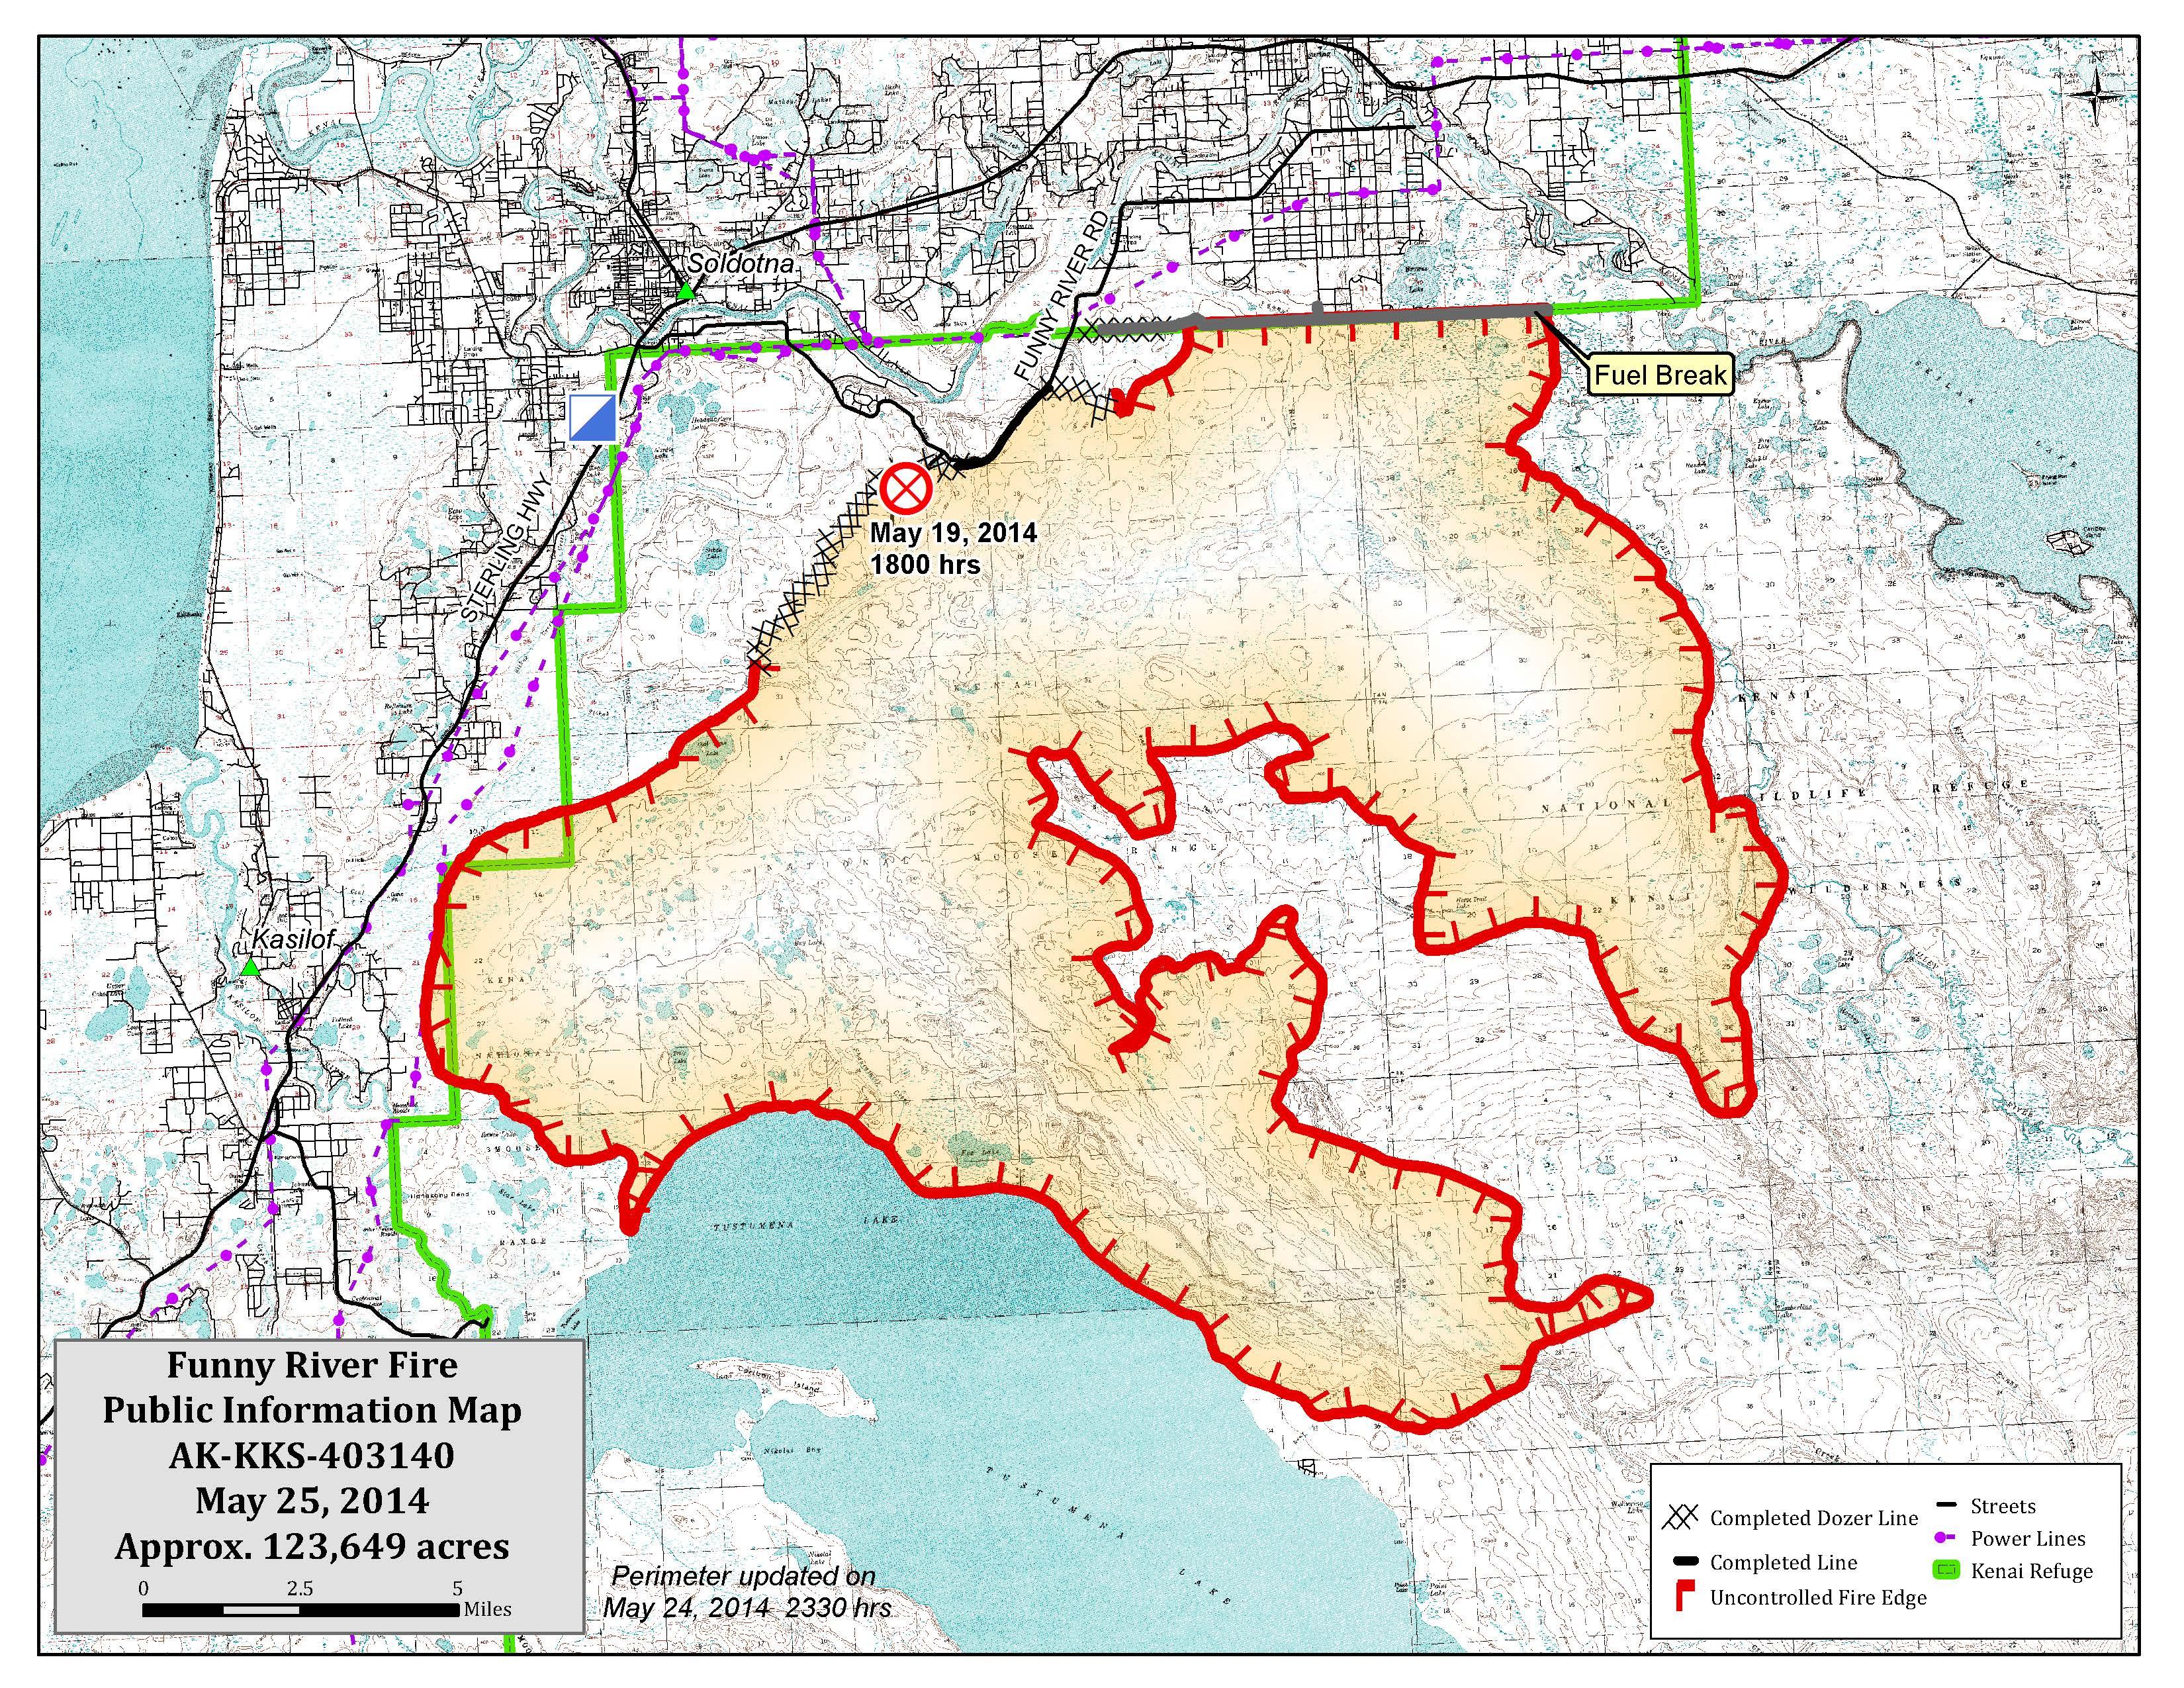 Funny River Fire Map 5 25 14 | AK Fire Info